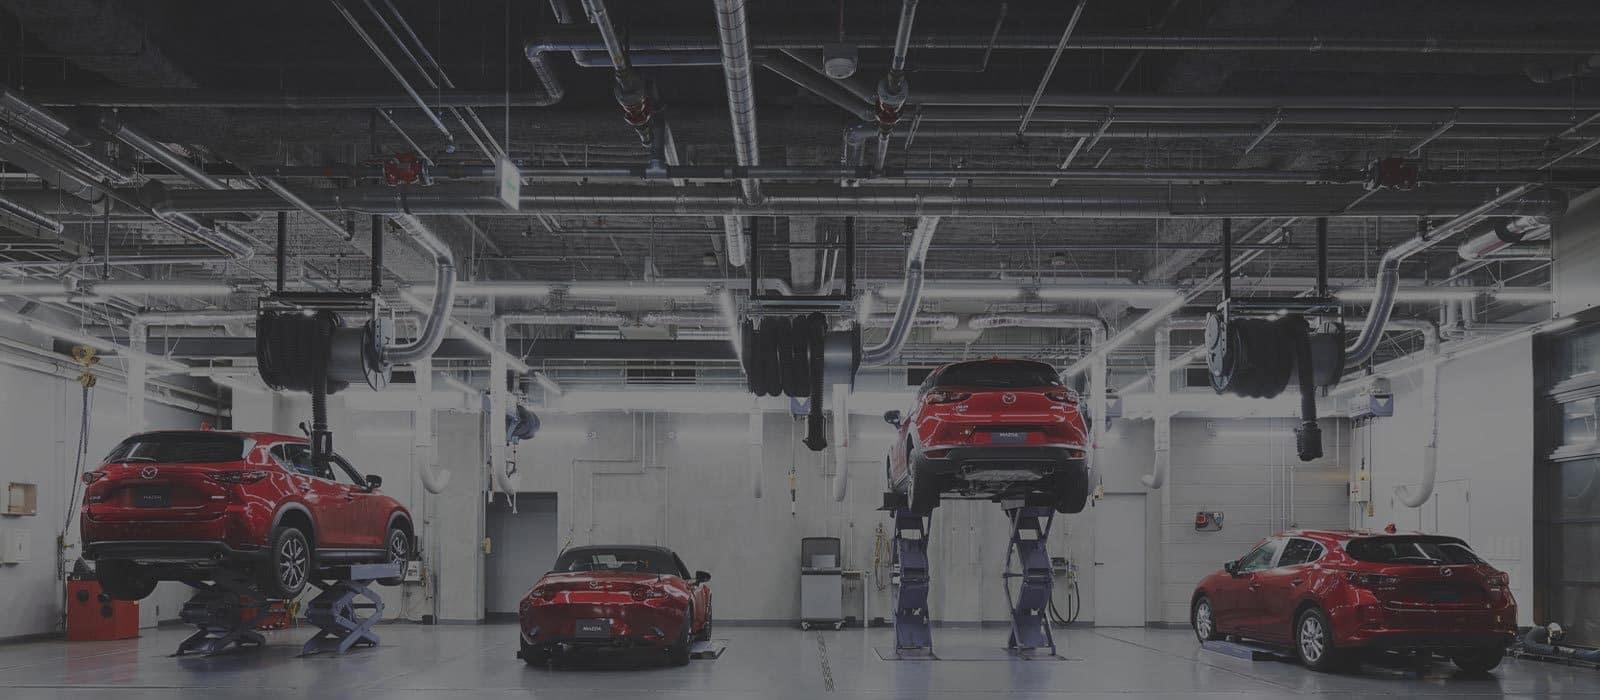 Sport-Mazda-North-Longwood-FL-32750-Service-Center-BG-Desktop1600x700